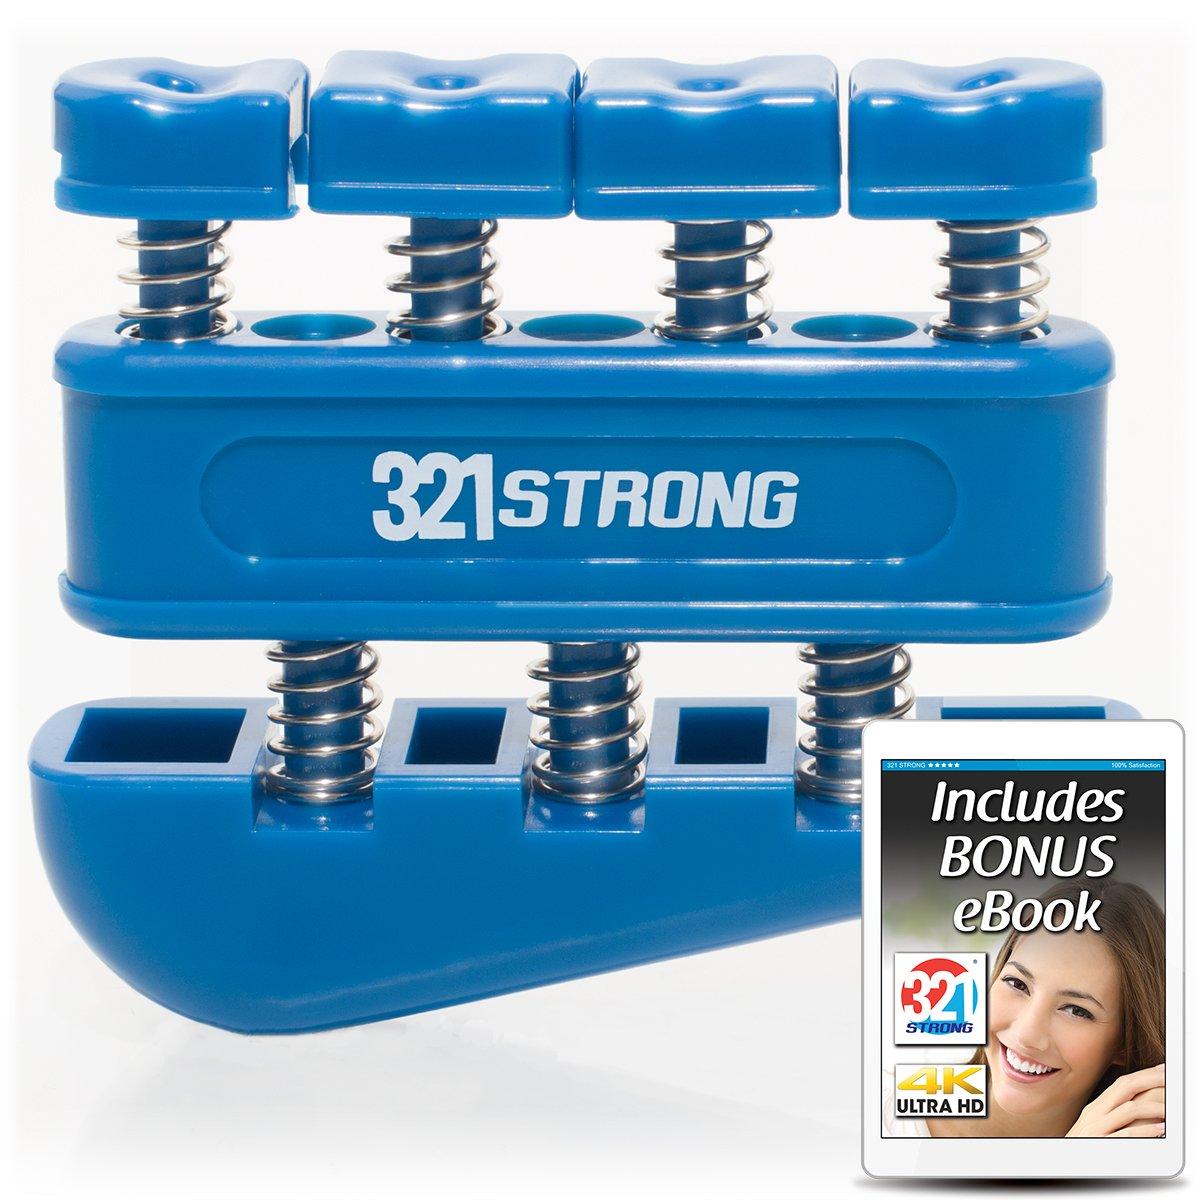 321 STRONG Finger Strengthener Gripper for Guitar by 321 STRONG